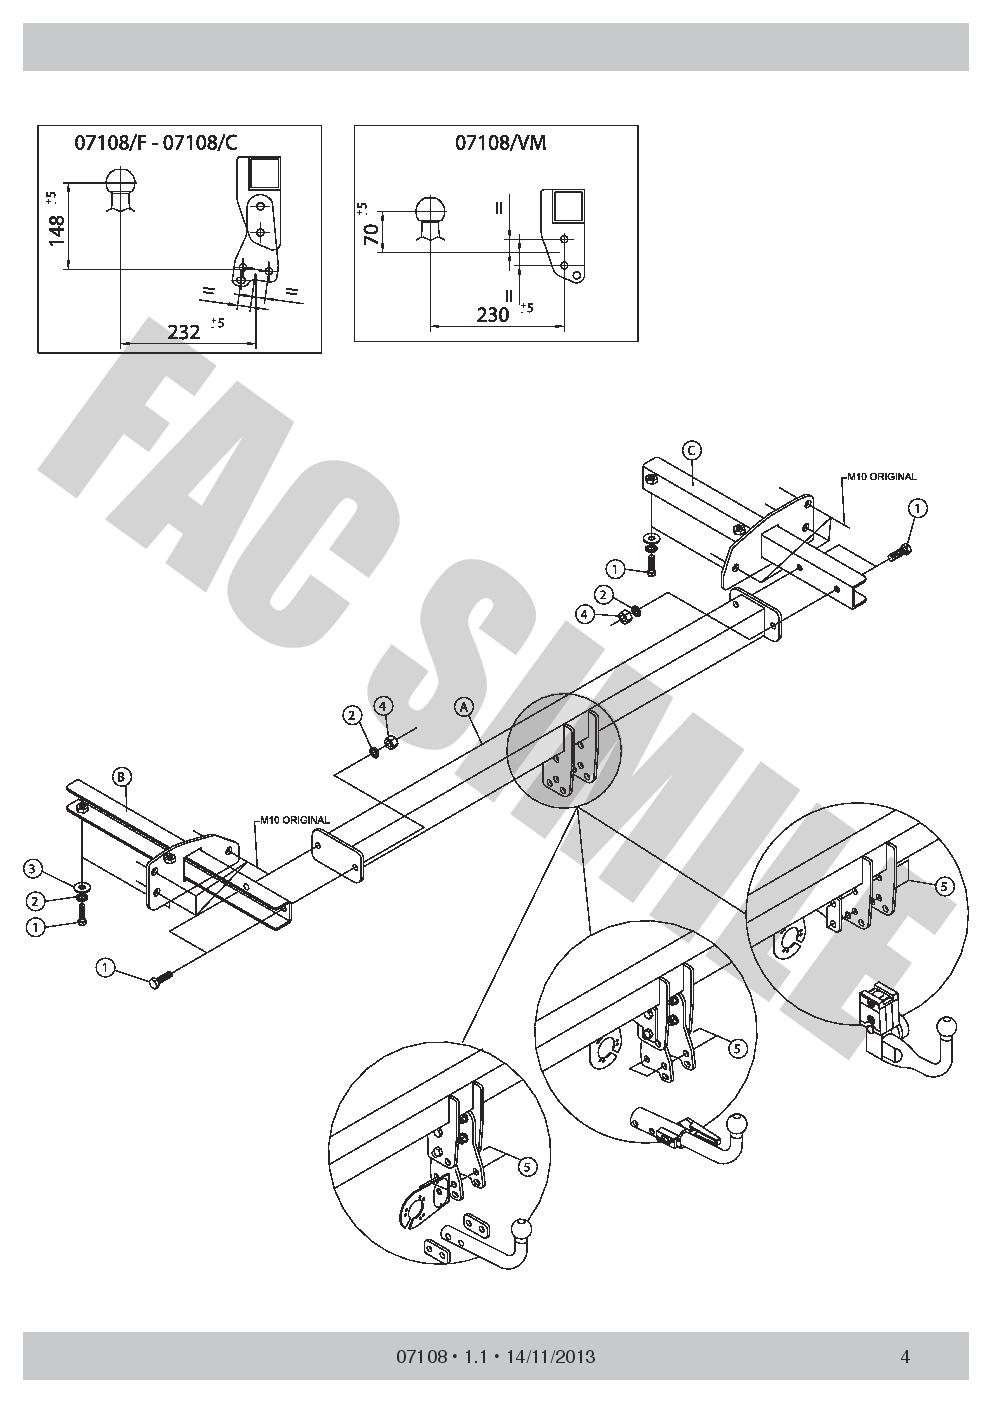 Detachable-Towbar-13p-Wiring-C2-for-Chevrolet-Cruze-